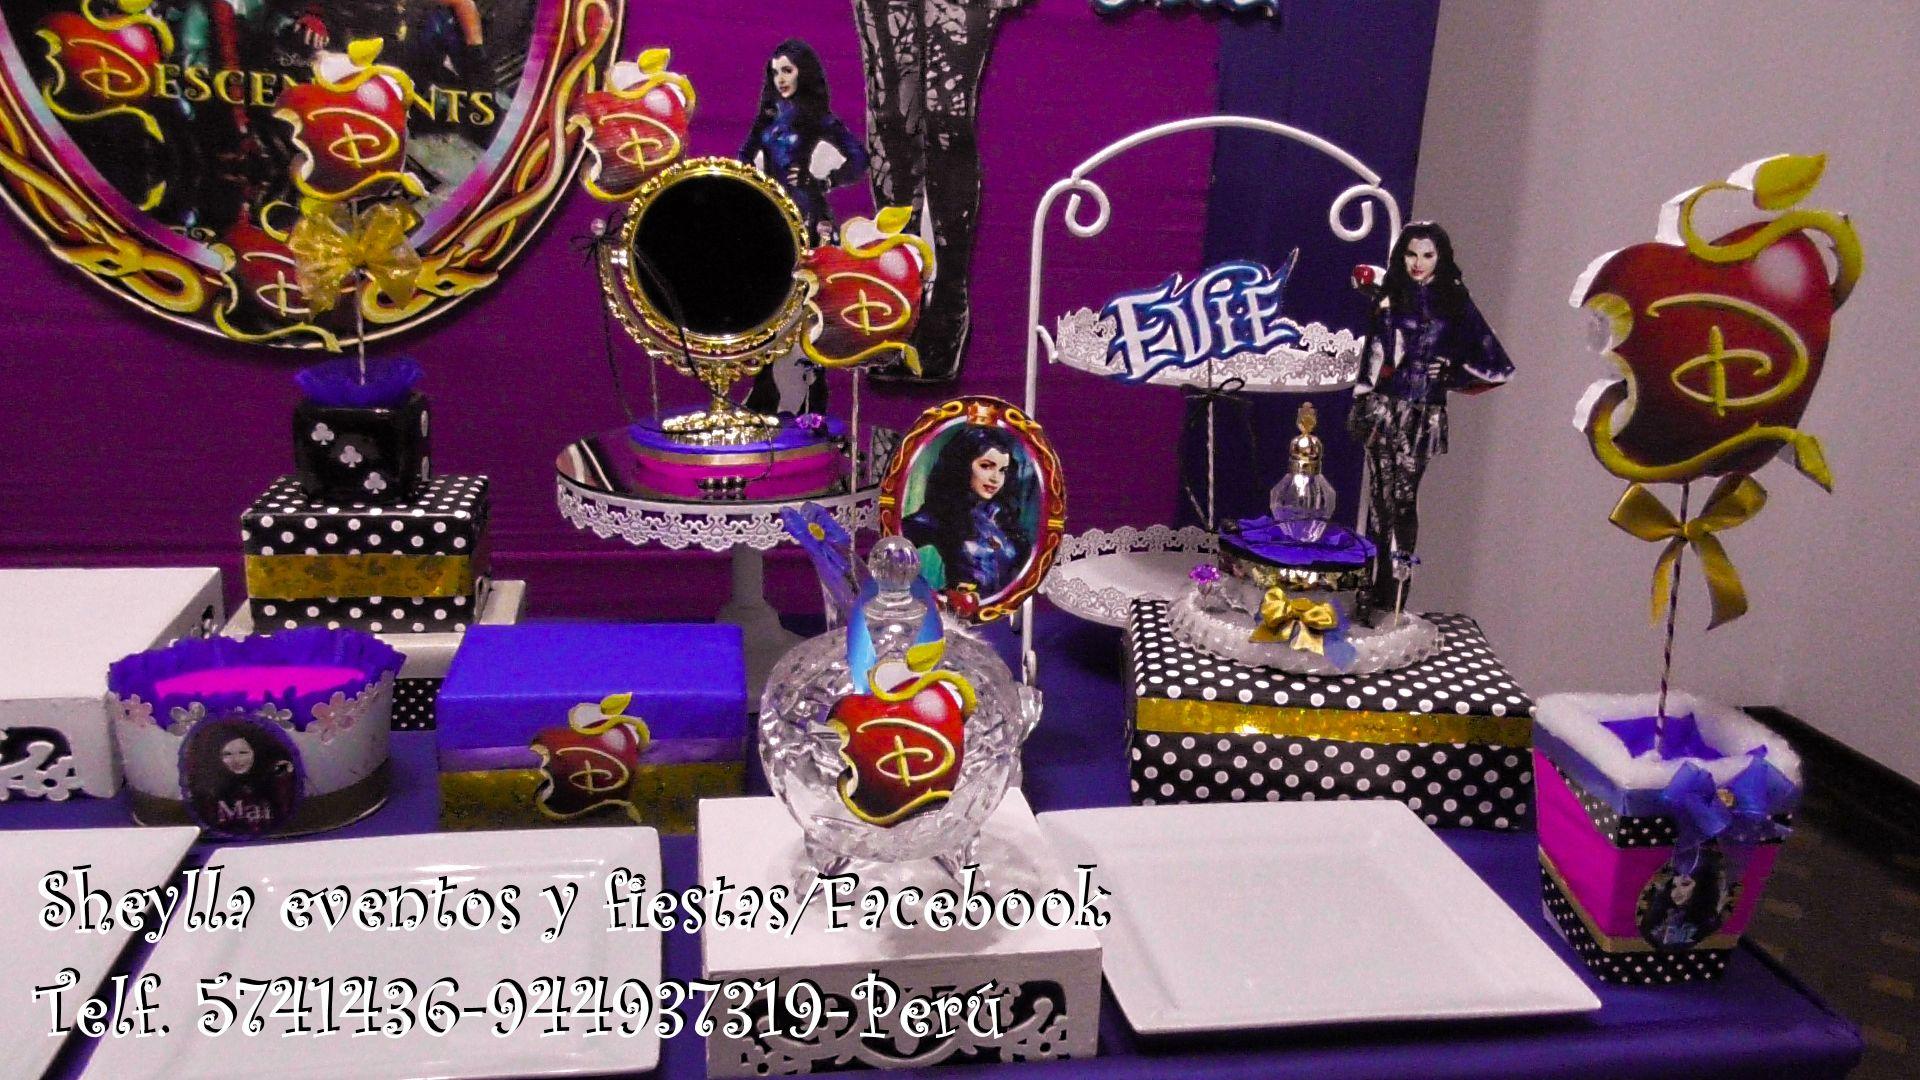 Decoraci n descendientes centros de mesa decoraci n de for Decoracion de tortas infantiles